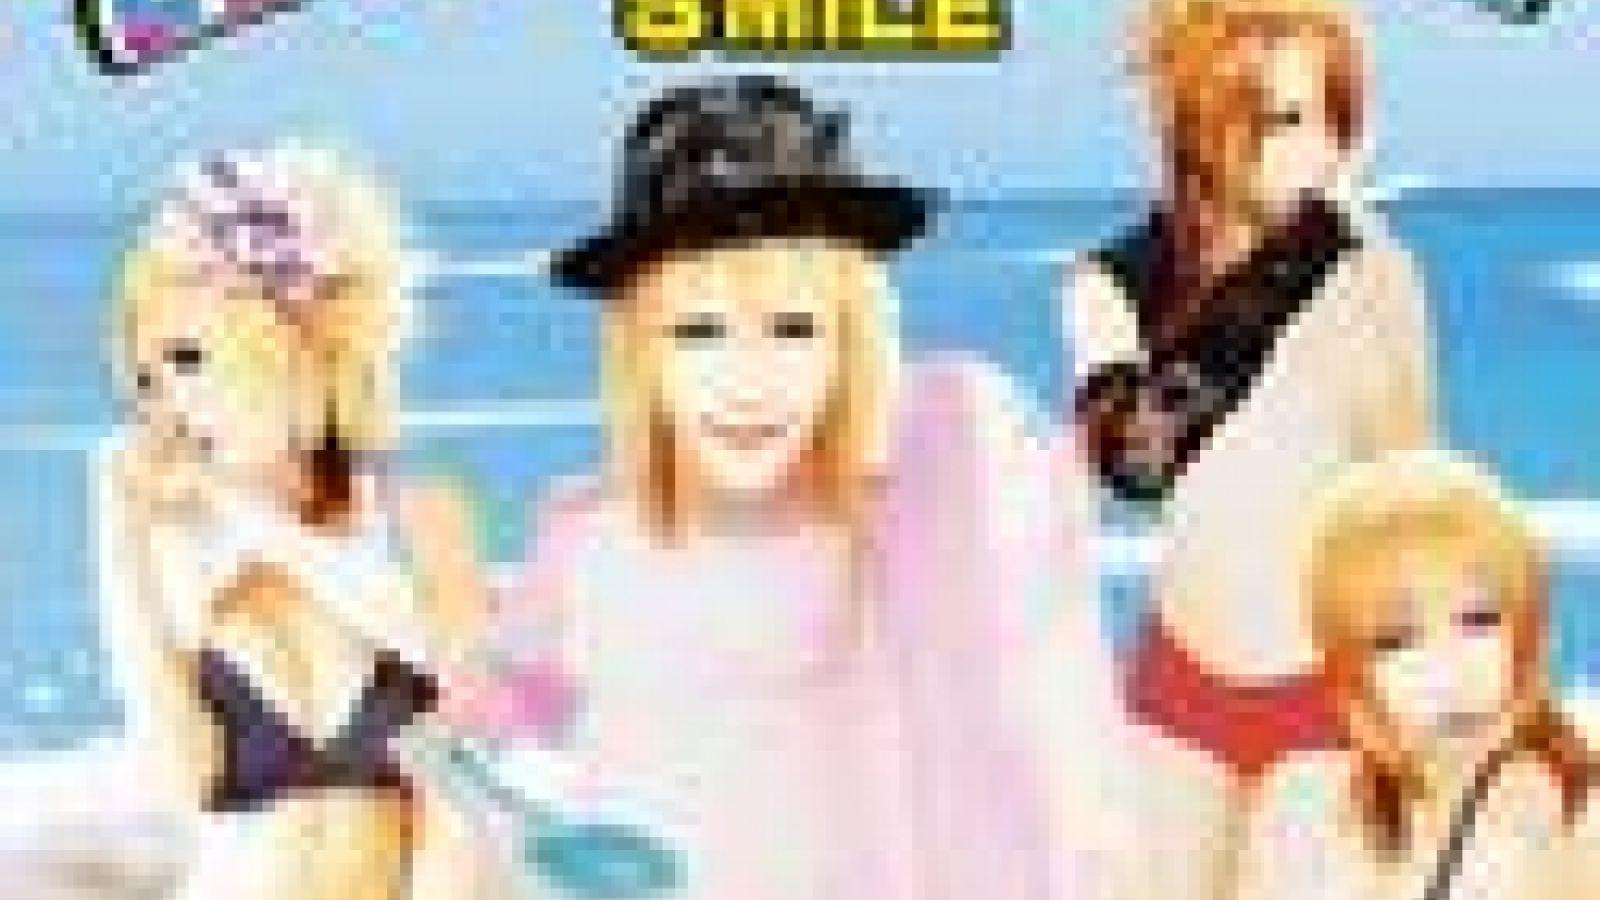 SMILE - ZETTAI☆SUMMER © JaME